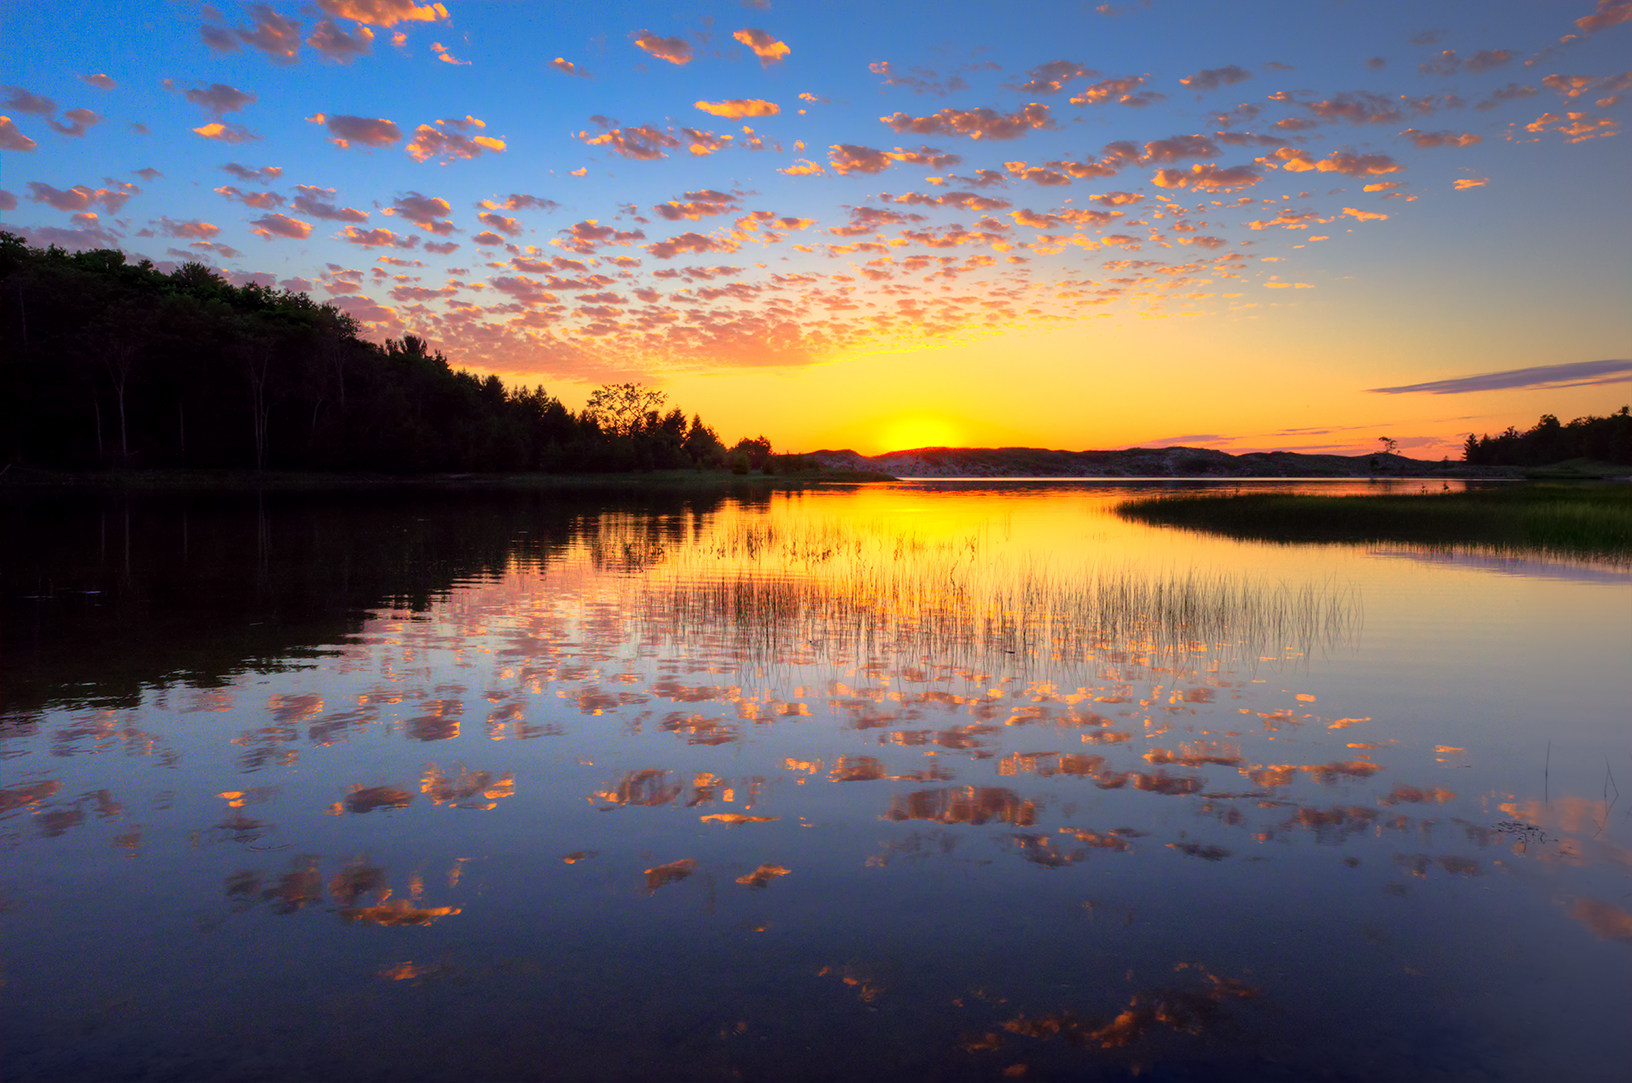 MI16-0677-5836 North Bar Sunset Reflections by Aubrieta V Hope Michigan Scenery.jpg